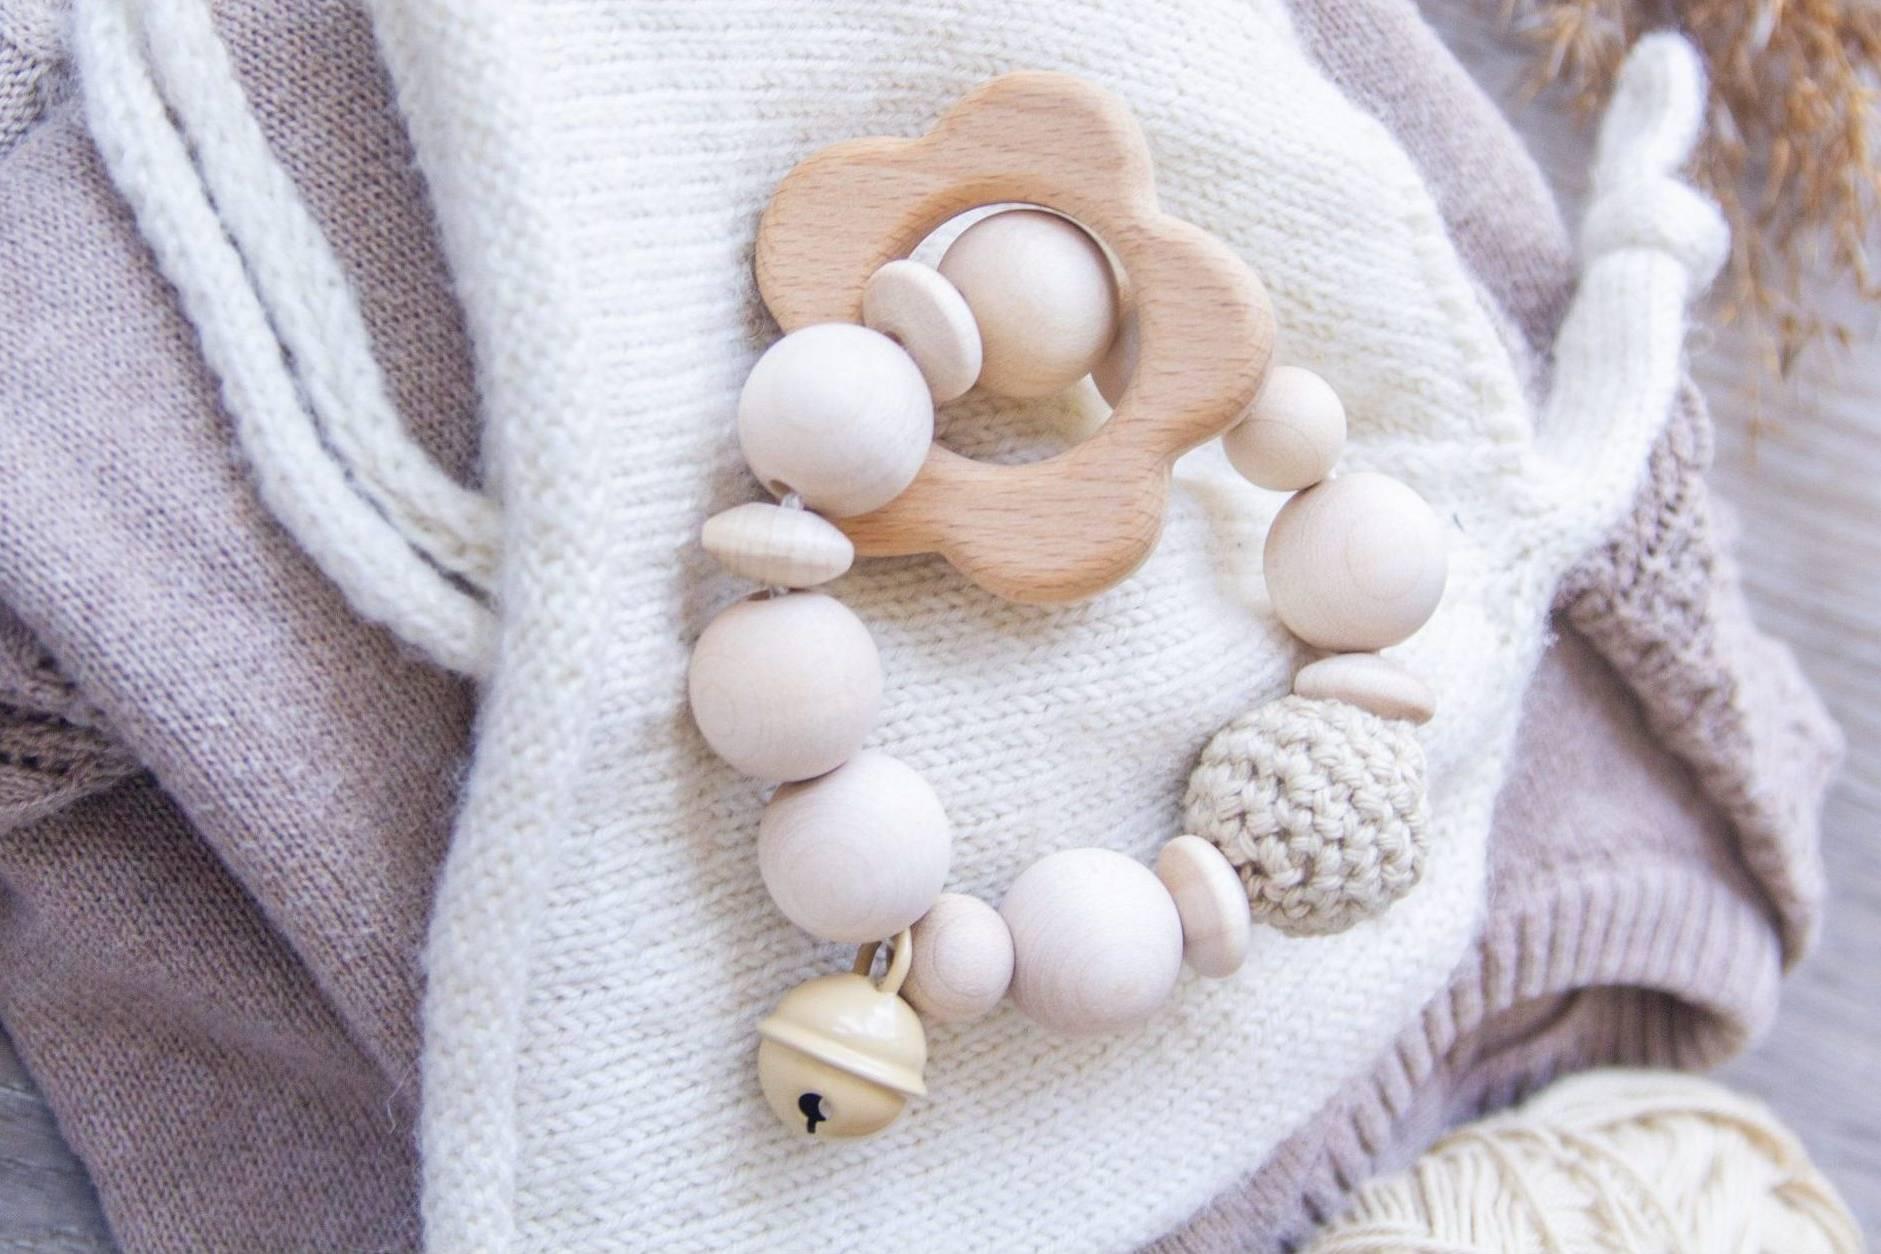 Lillesoeur-handgemacht-Babygeschenke-Schnullerkette-Greifling